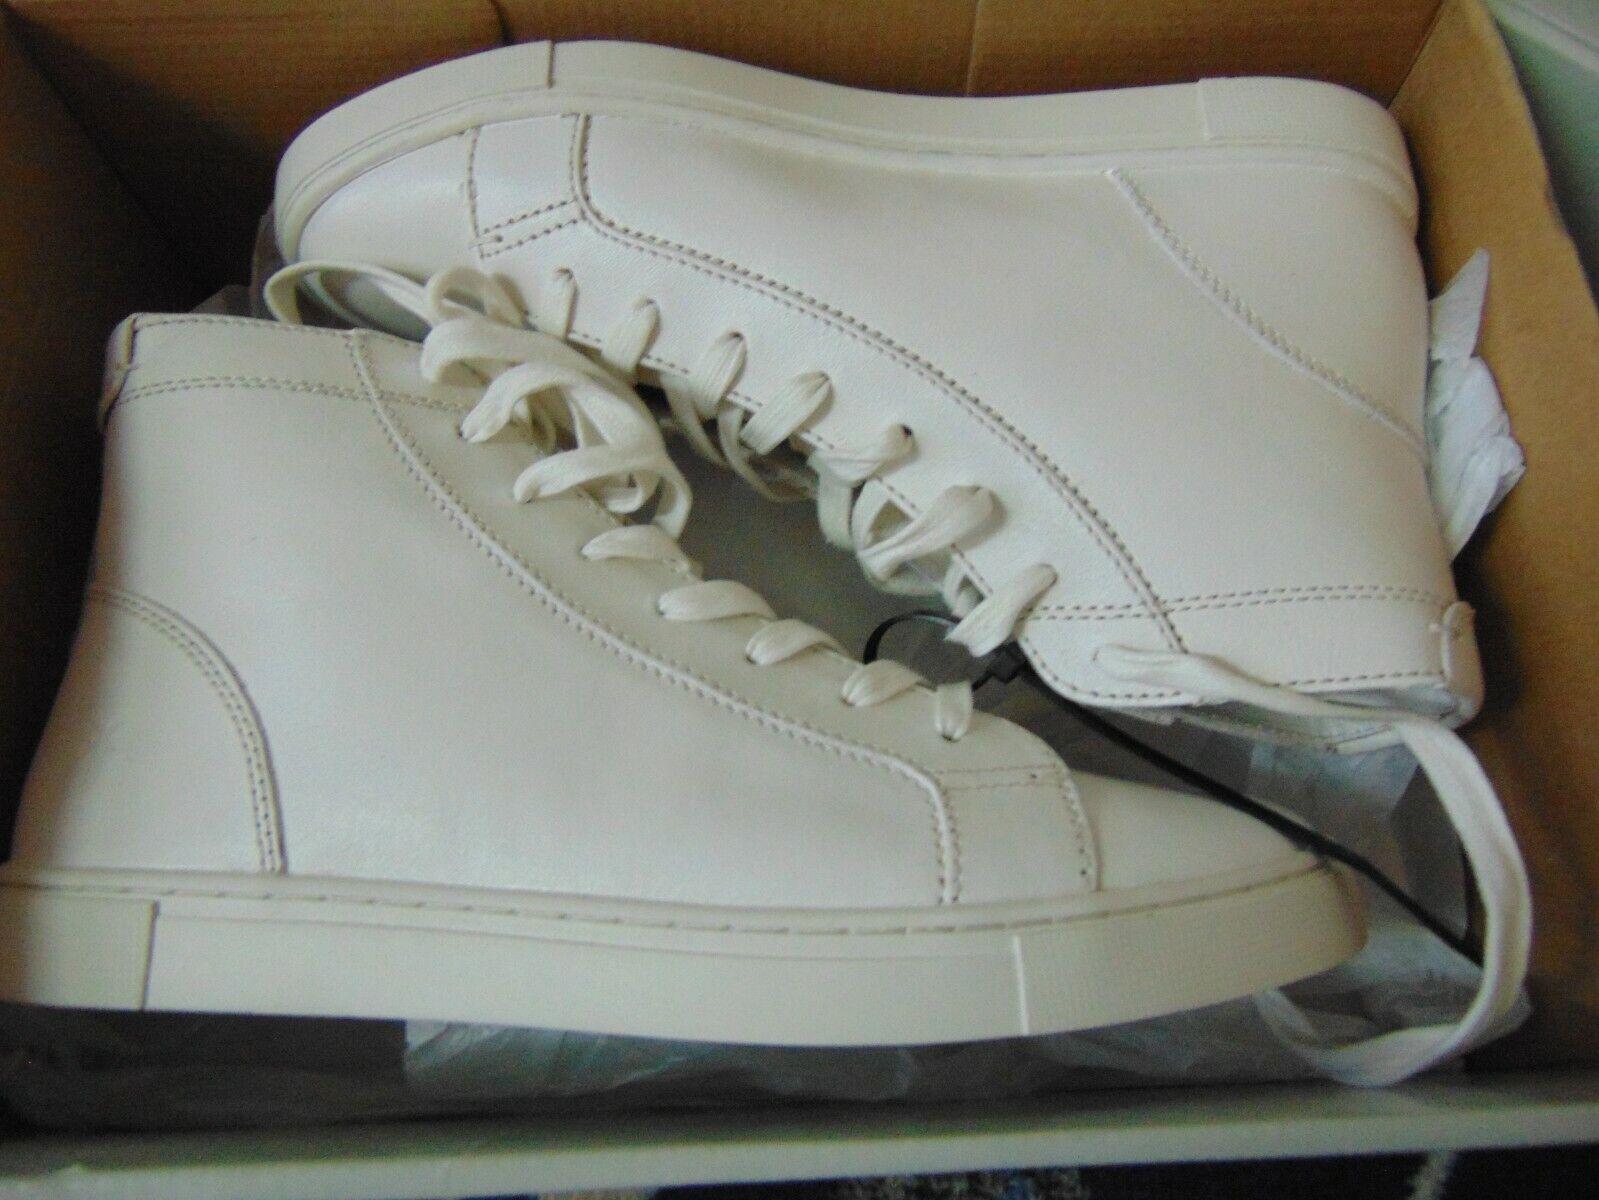 Brand New Frye Wouomo Gemma High bianca scarpe da ginnastica Sz 9M